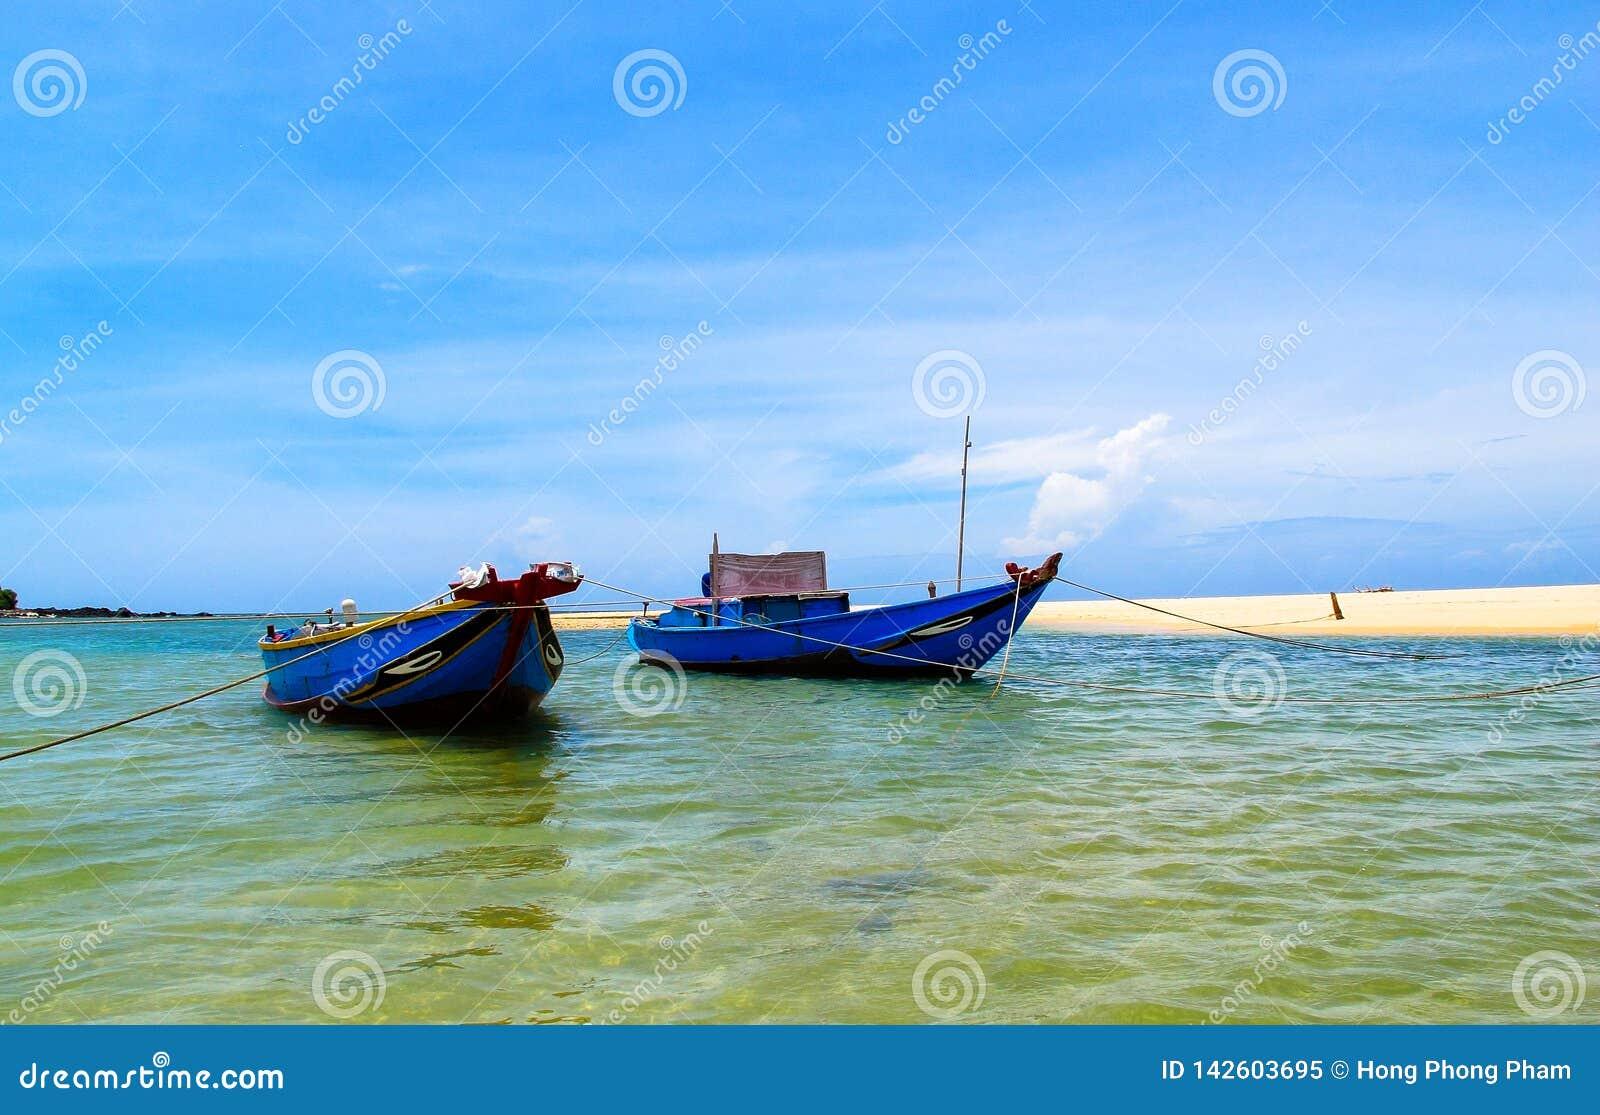 Couple of ship on the beach